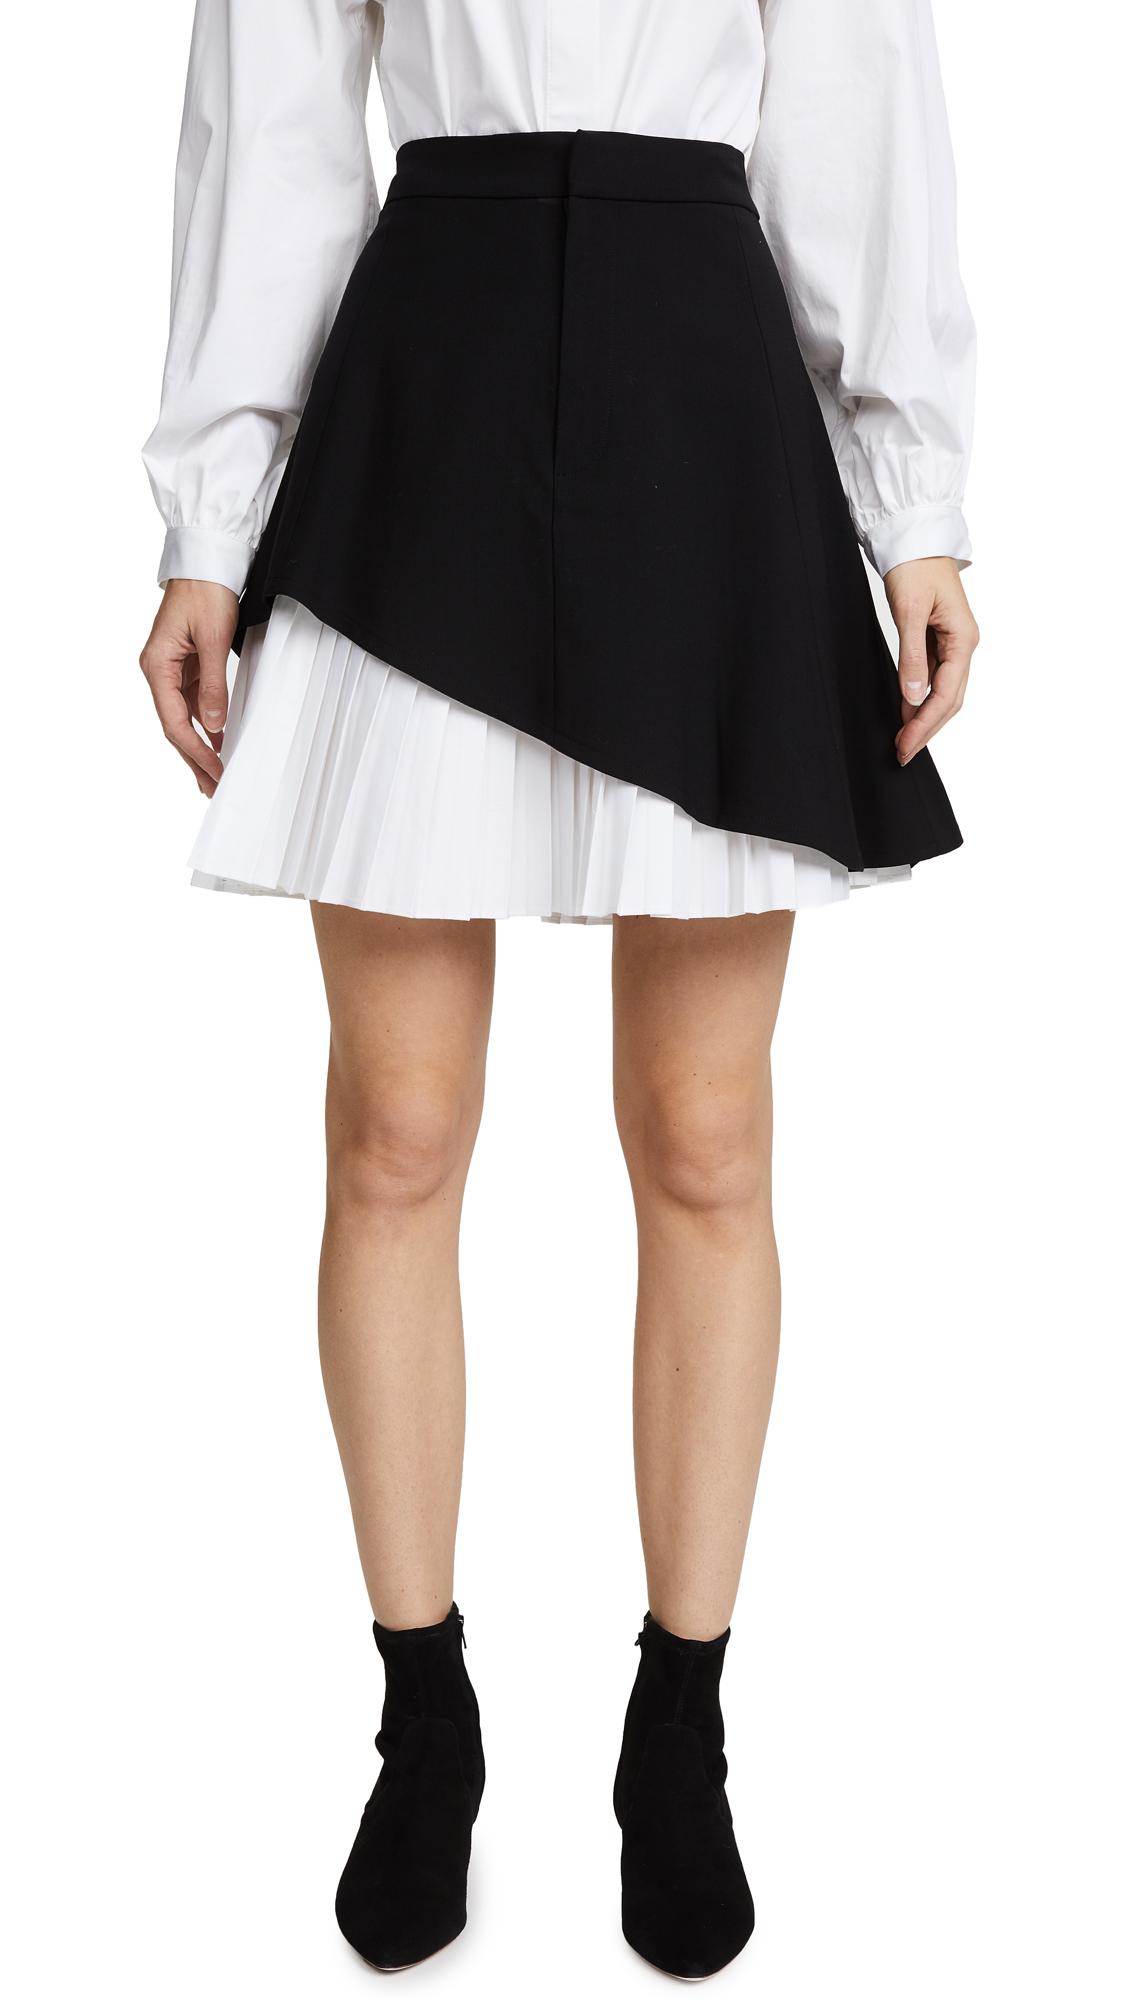 Alexis Dani Miniskirt - Black/White